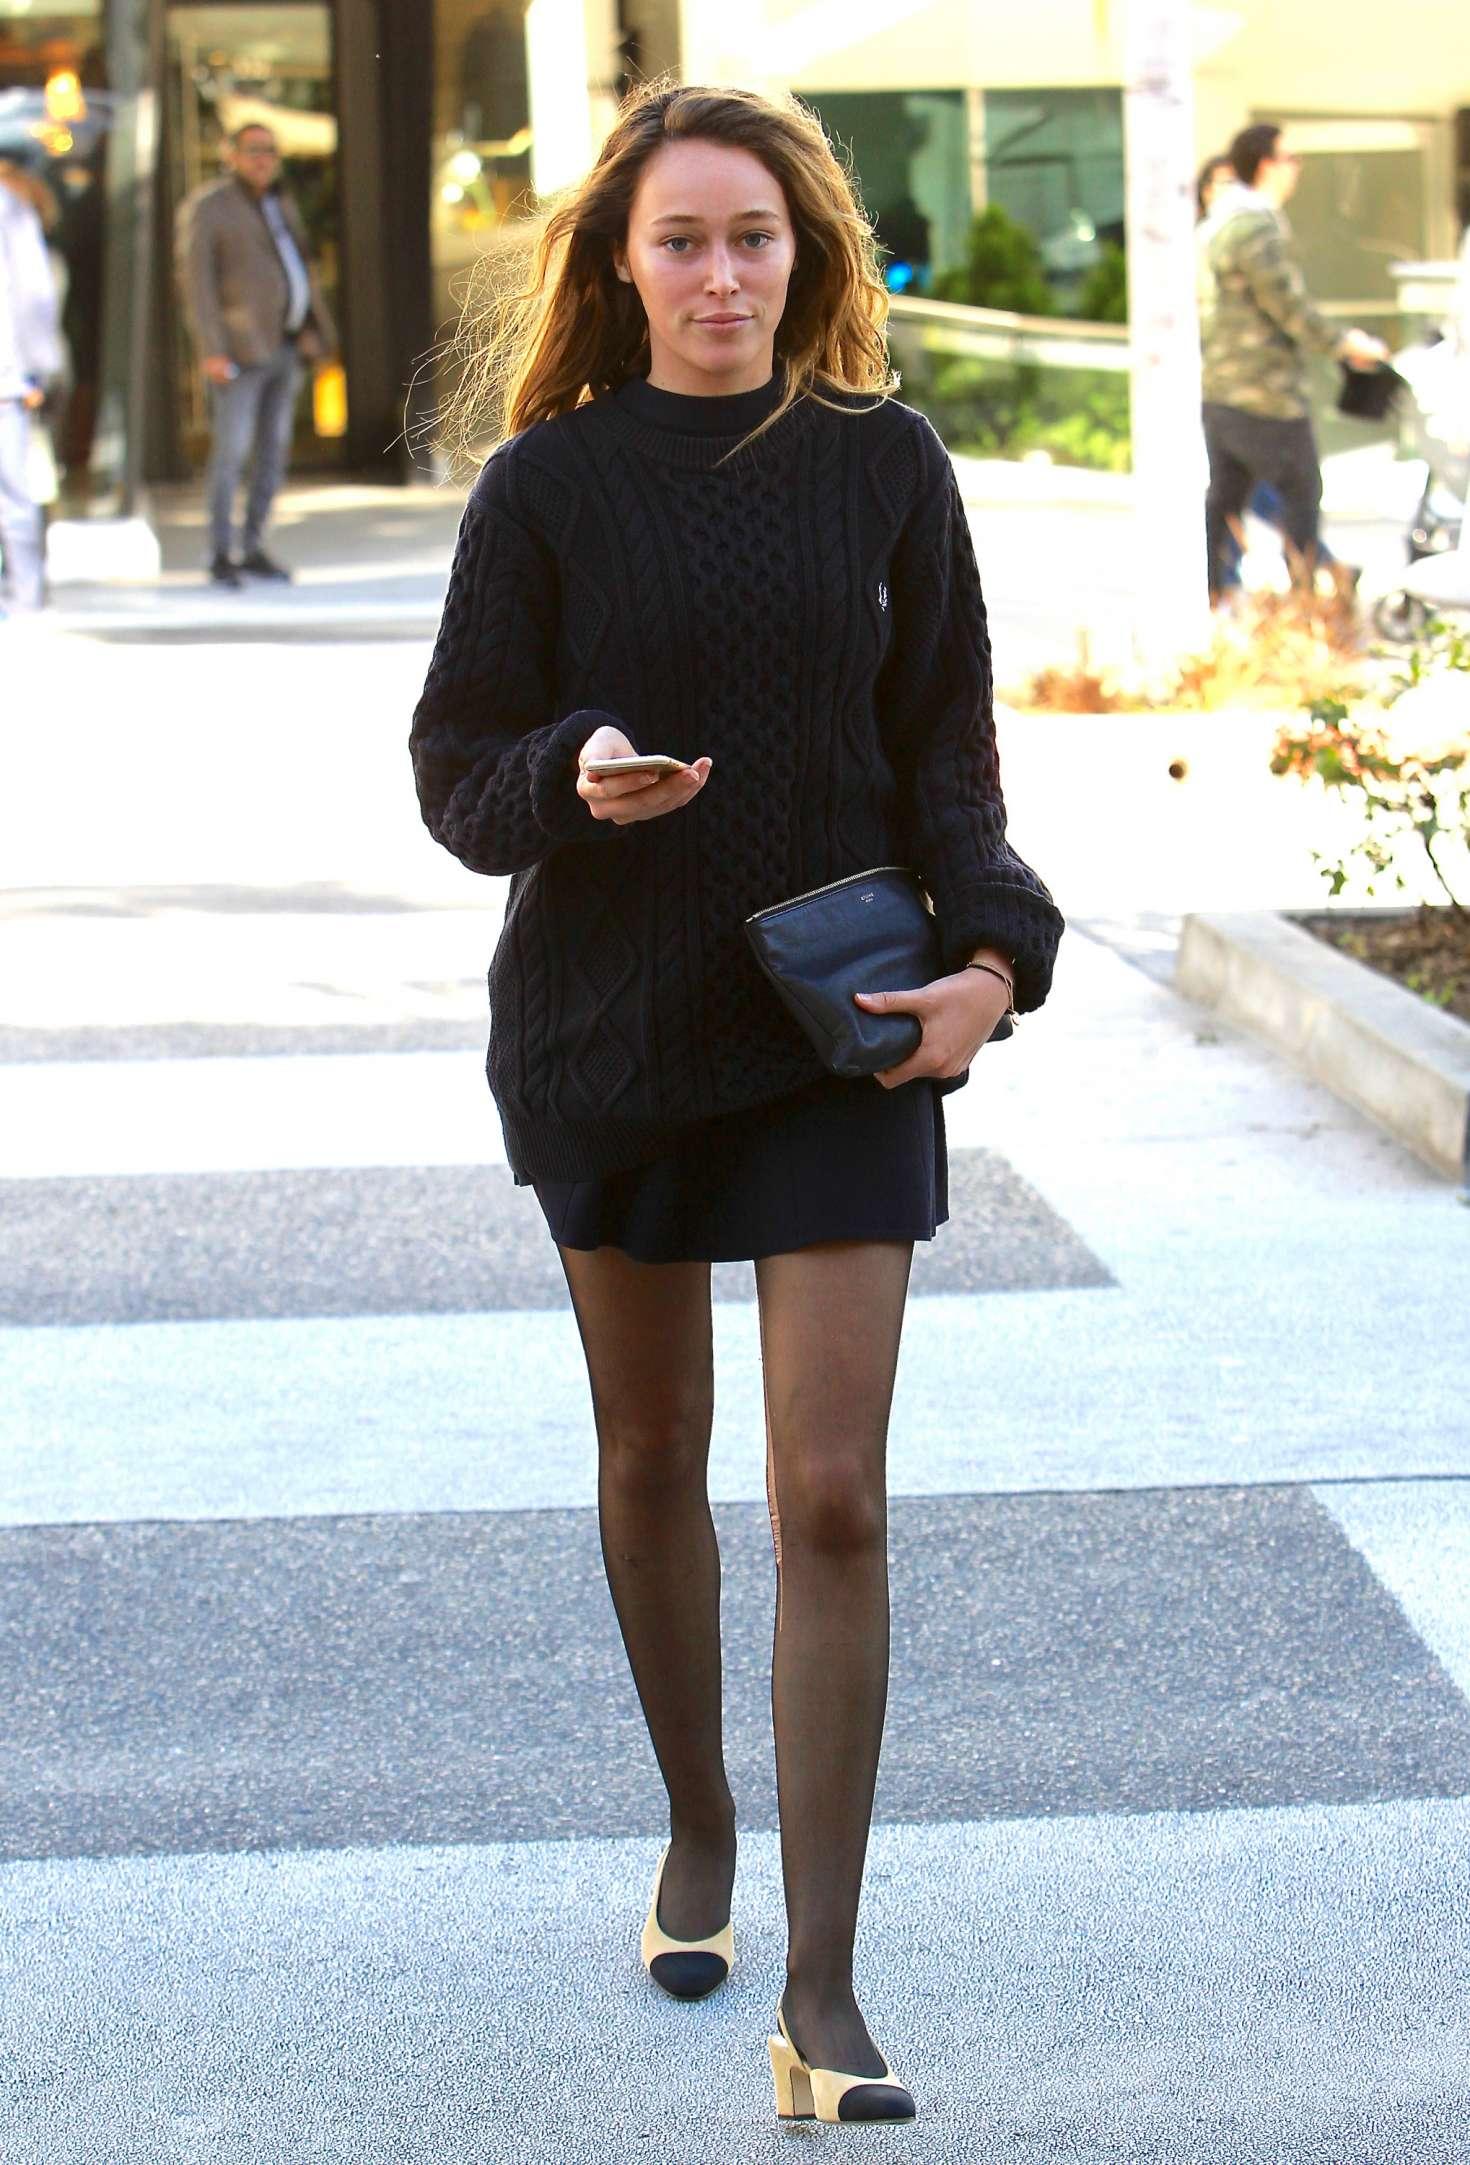 Hot Alycia Debnam-Carey  nudes (25 photo), YouTube, cameltoe